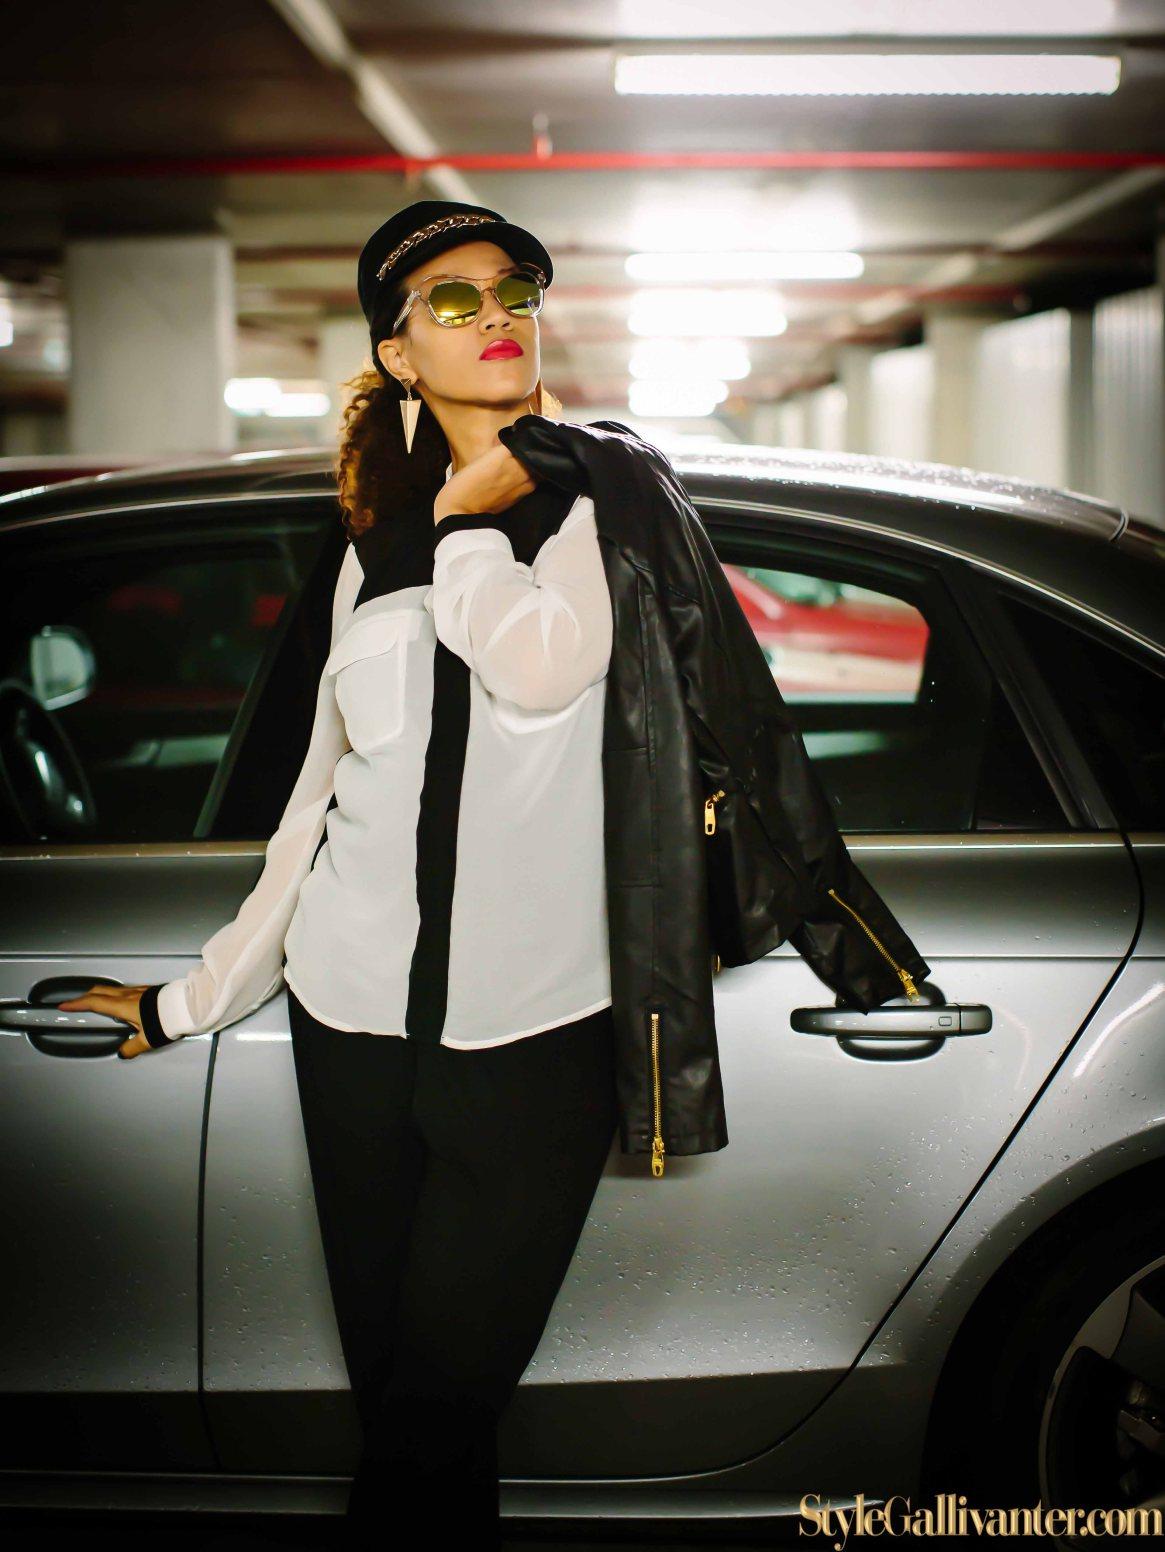 pretty-girl-rock_kerry-hison-style_rihanna-fashion-style-2014_top-fashion-style-bloggers-melbourne_australia's-top-stylists_australias-top-personal-style-fashion-blogs_vogue-2014-12